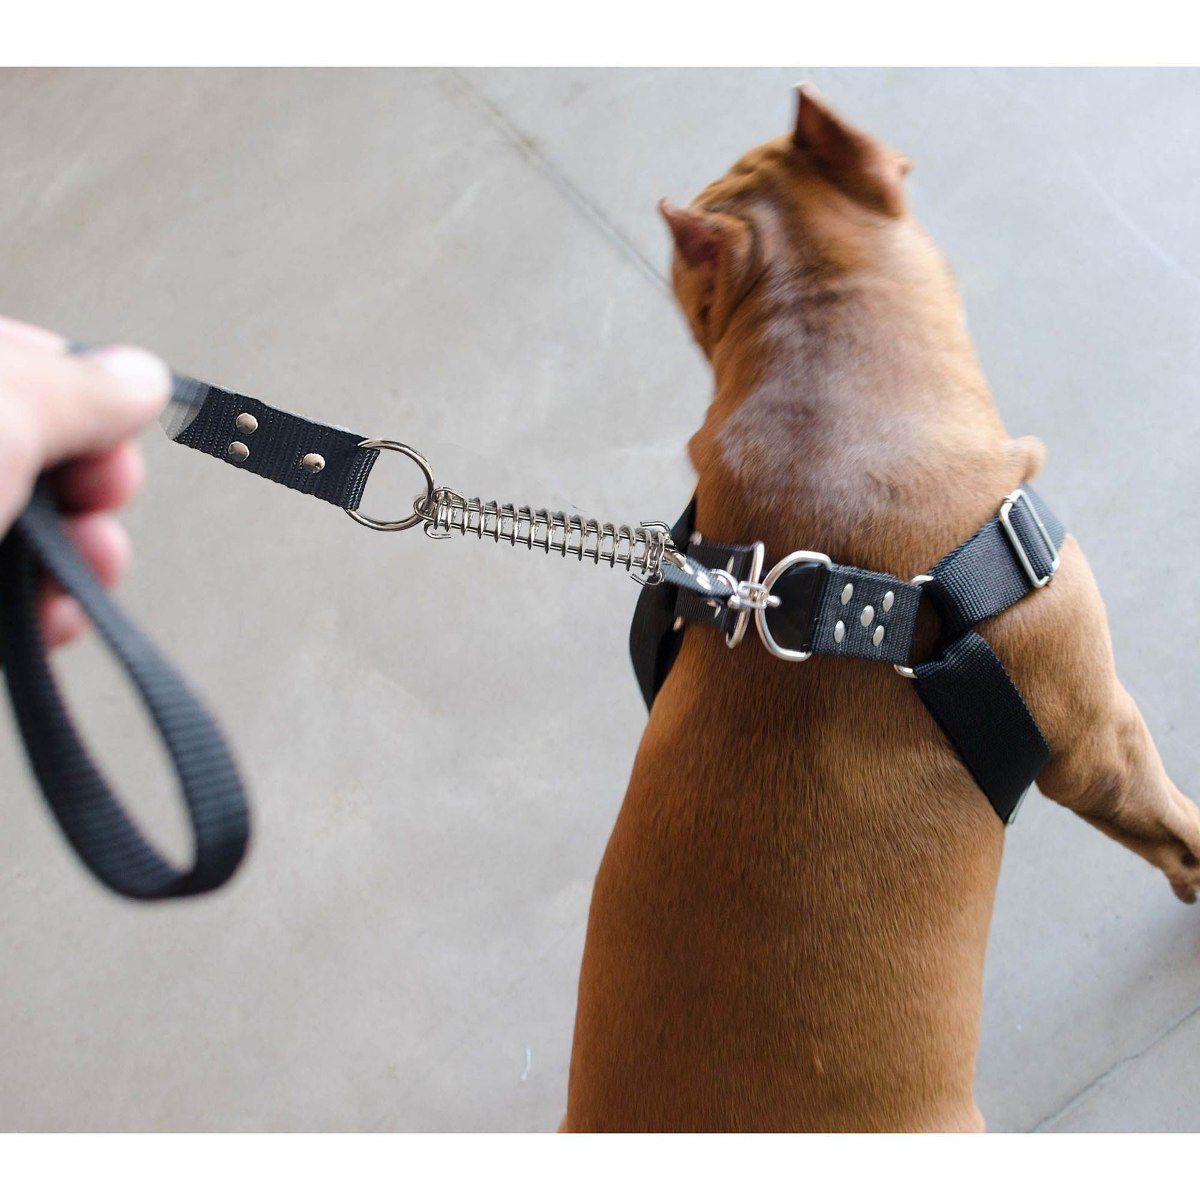 Coleira Peitoral Guia Cinto Segurança Cachorro Doberman Pitbull Anti Puxao - M Preto